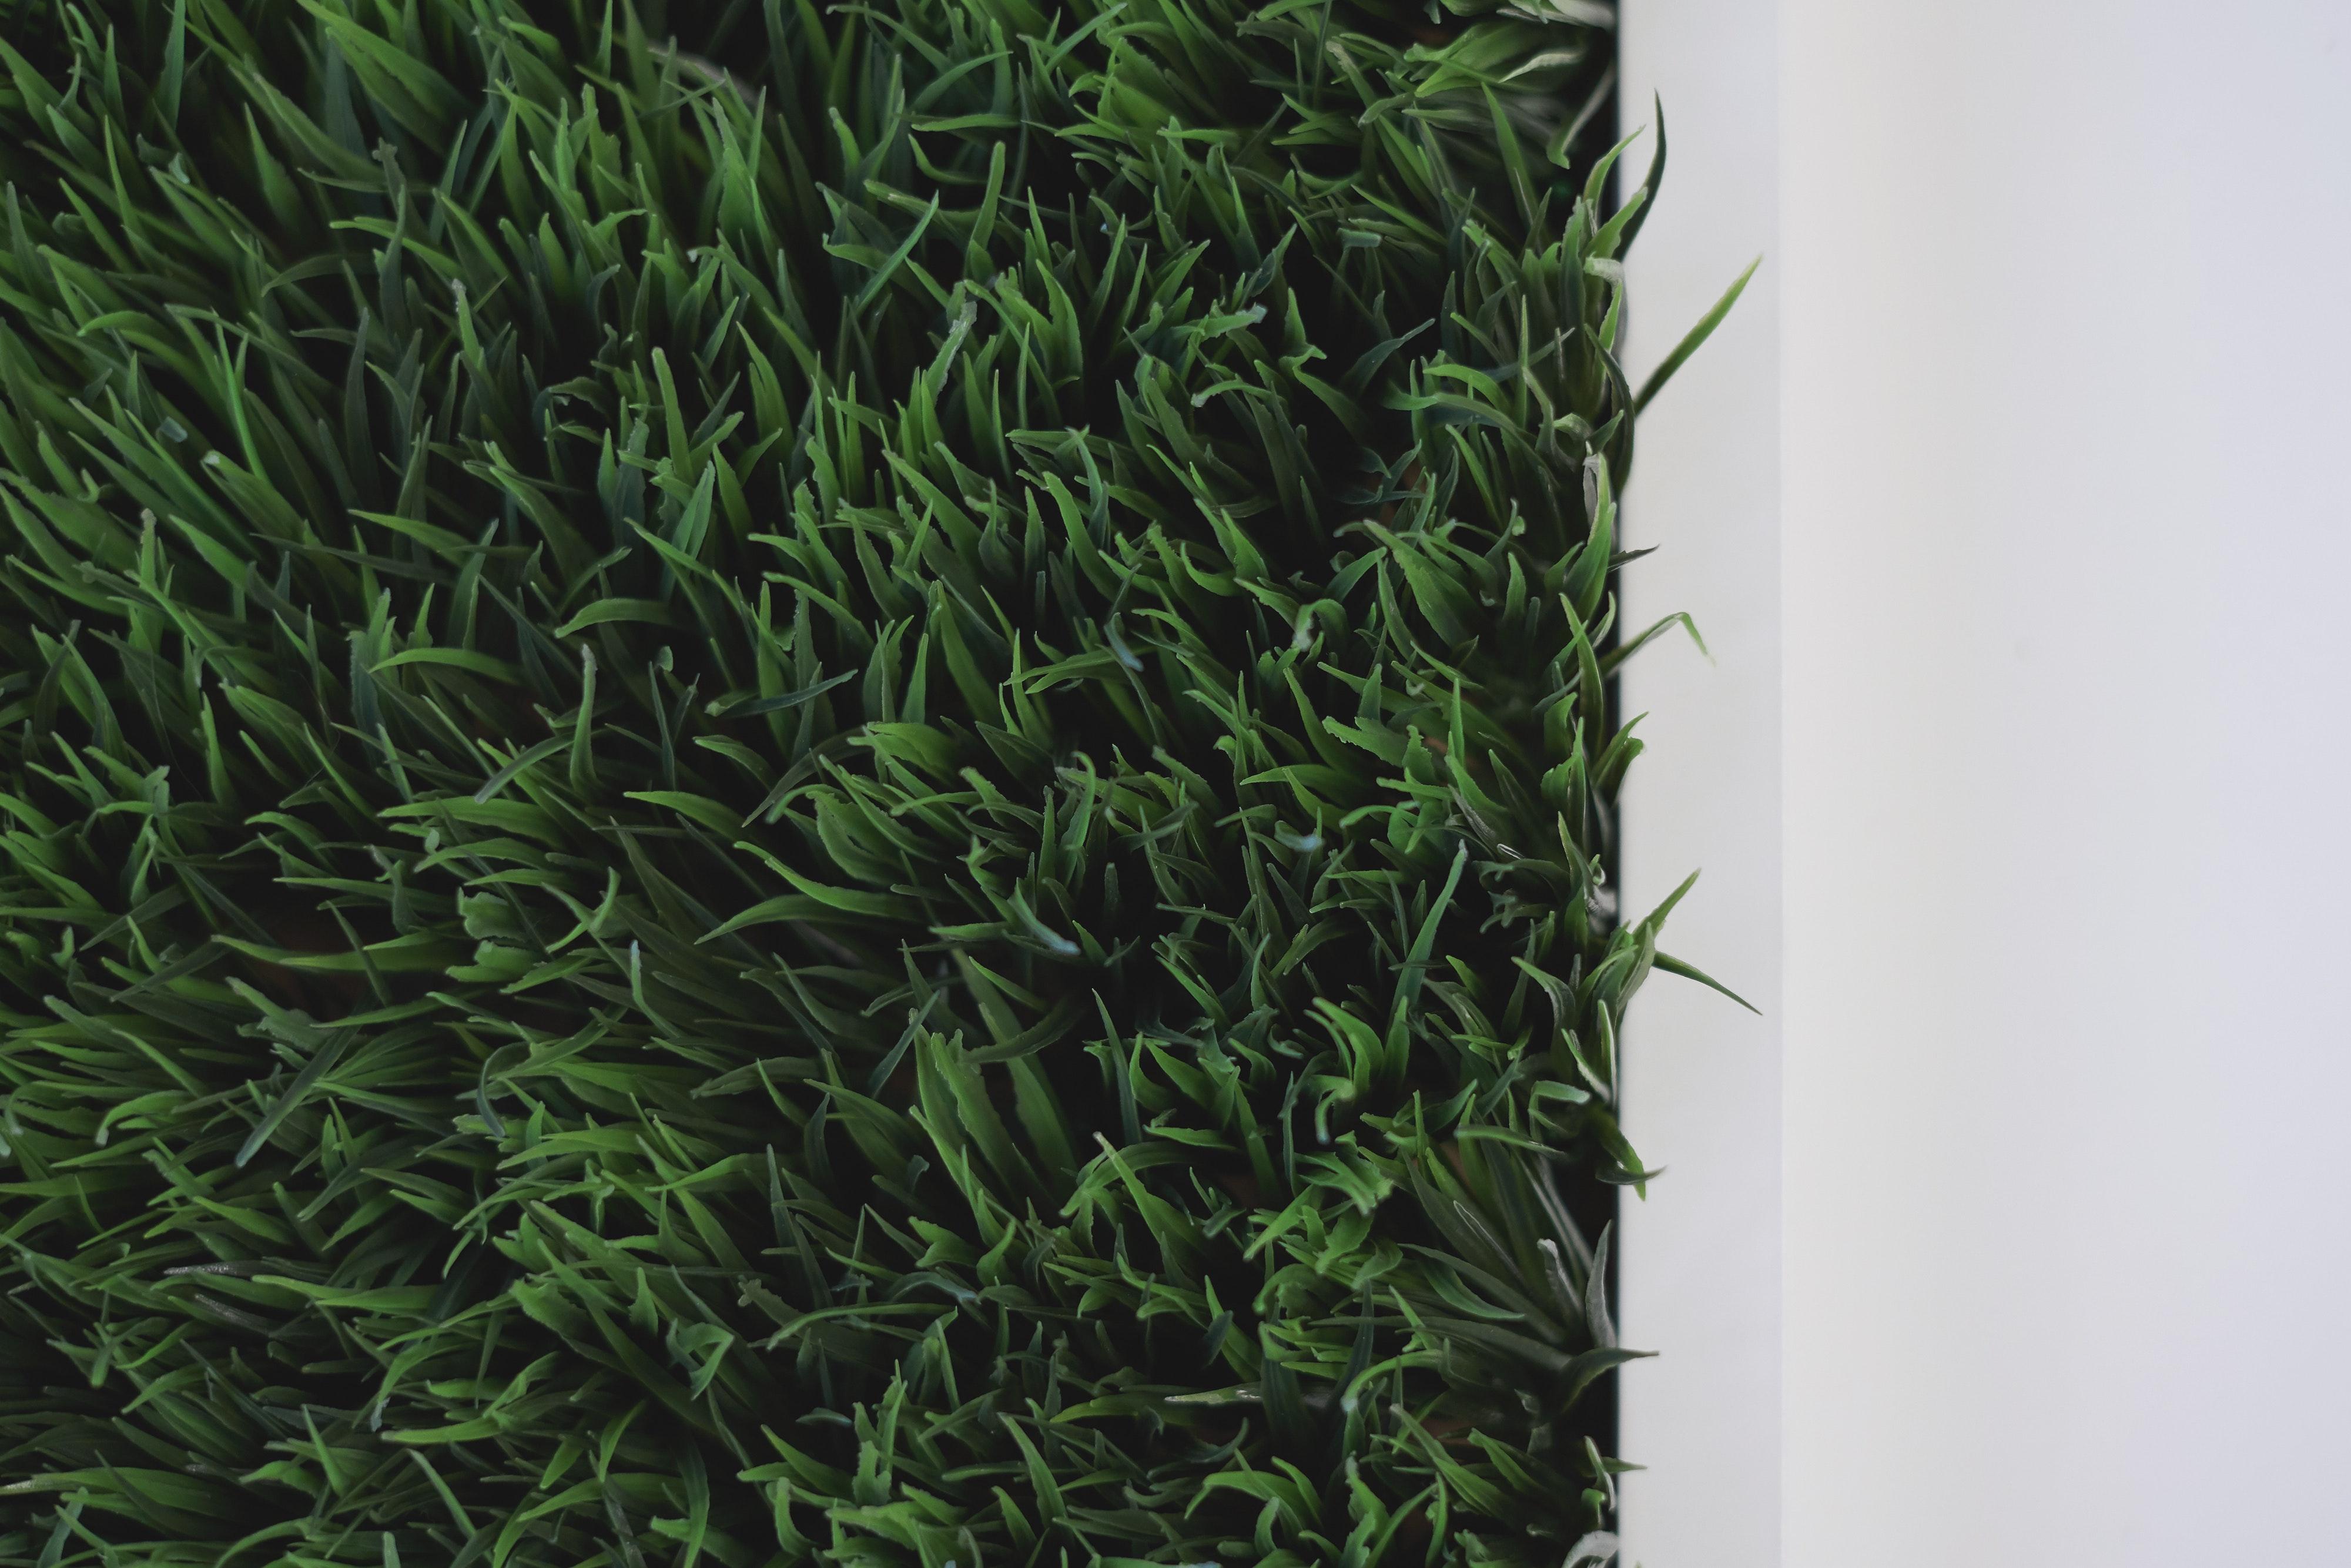 Close-up photo of green grass